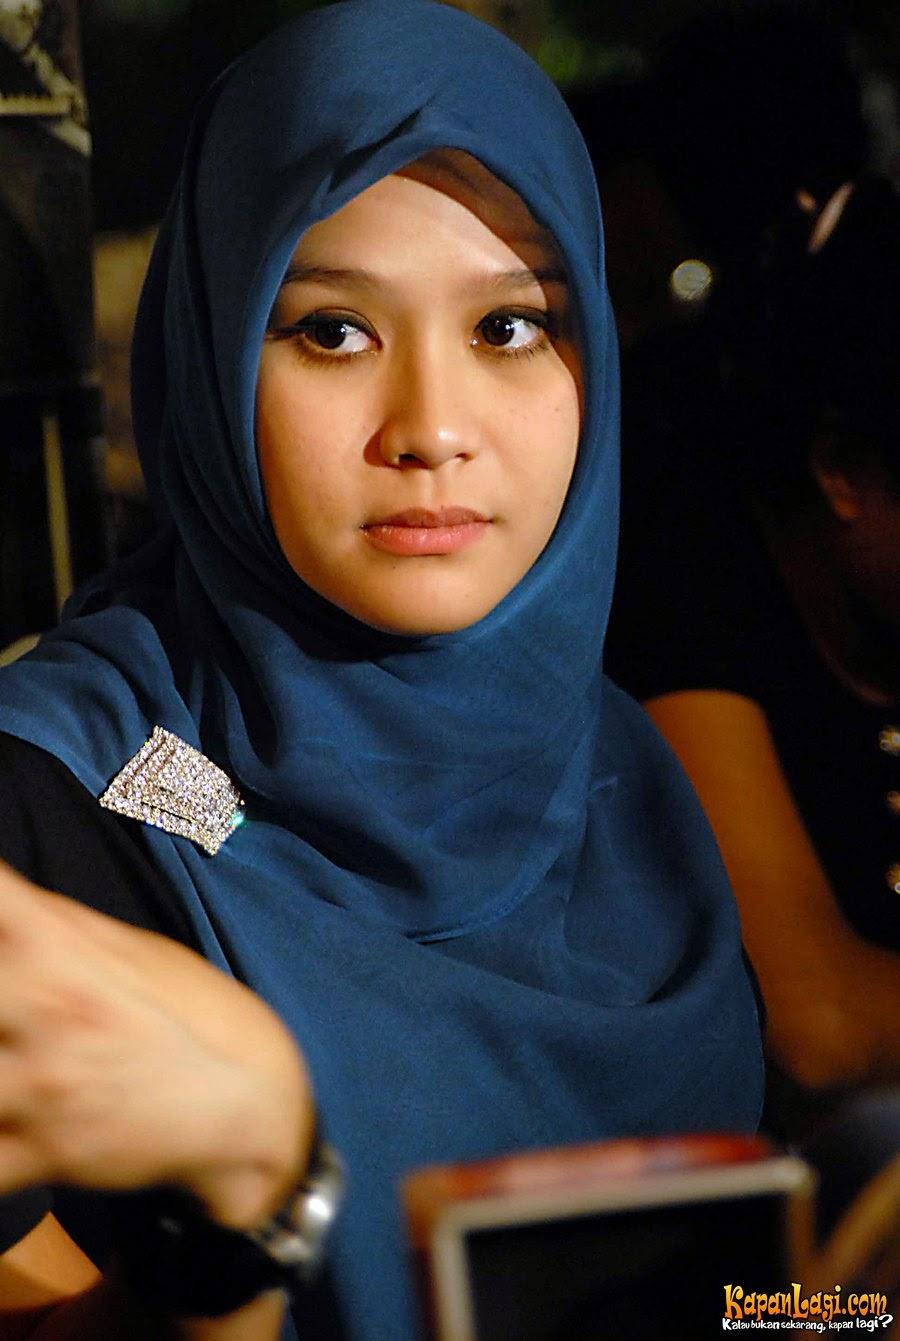 Kumpulan Foto Artis Berjilbab ~ AUFA BLOG